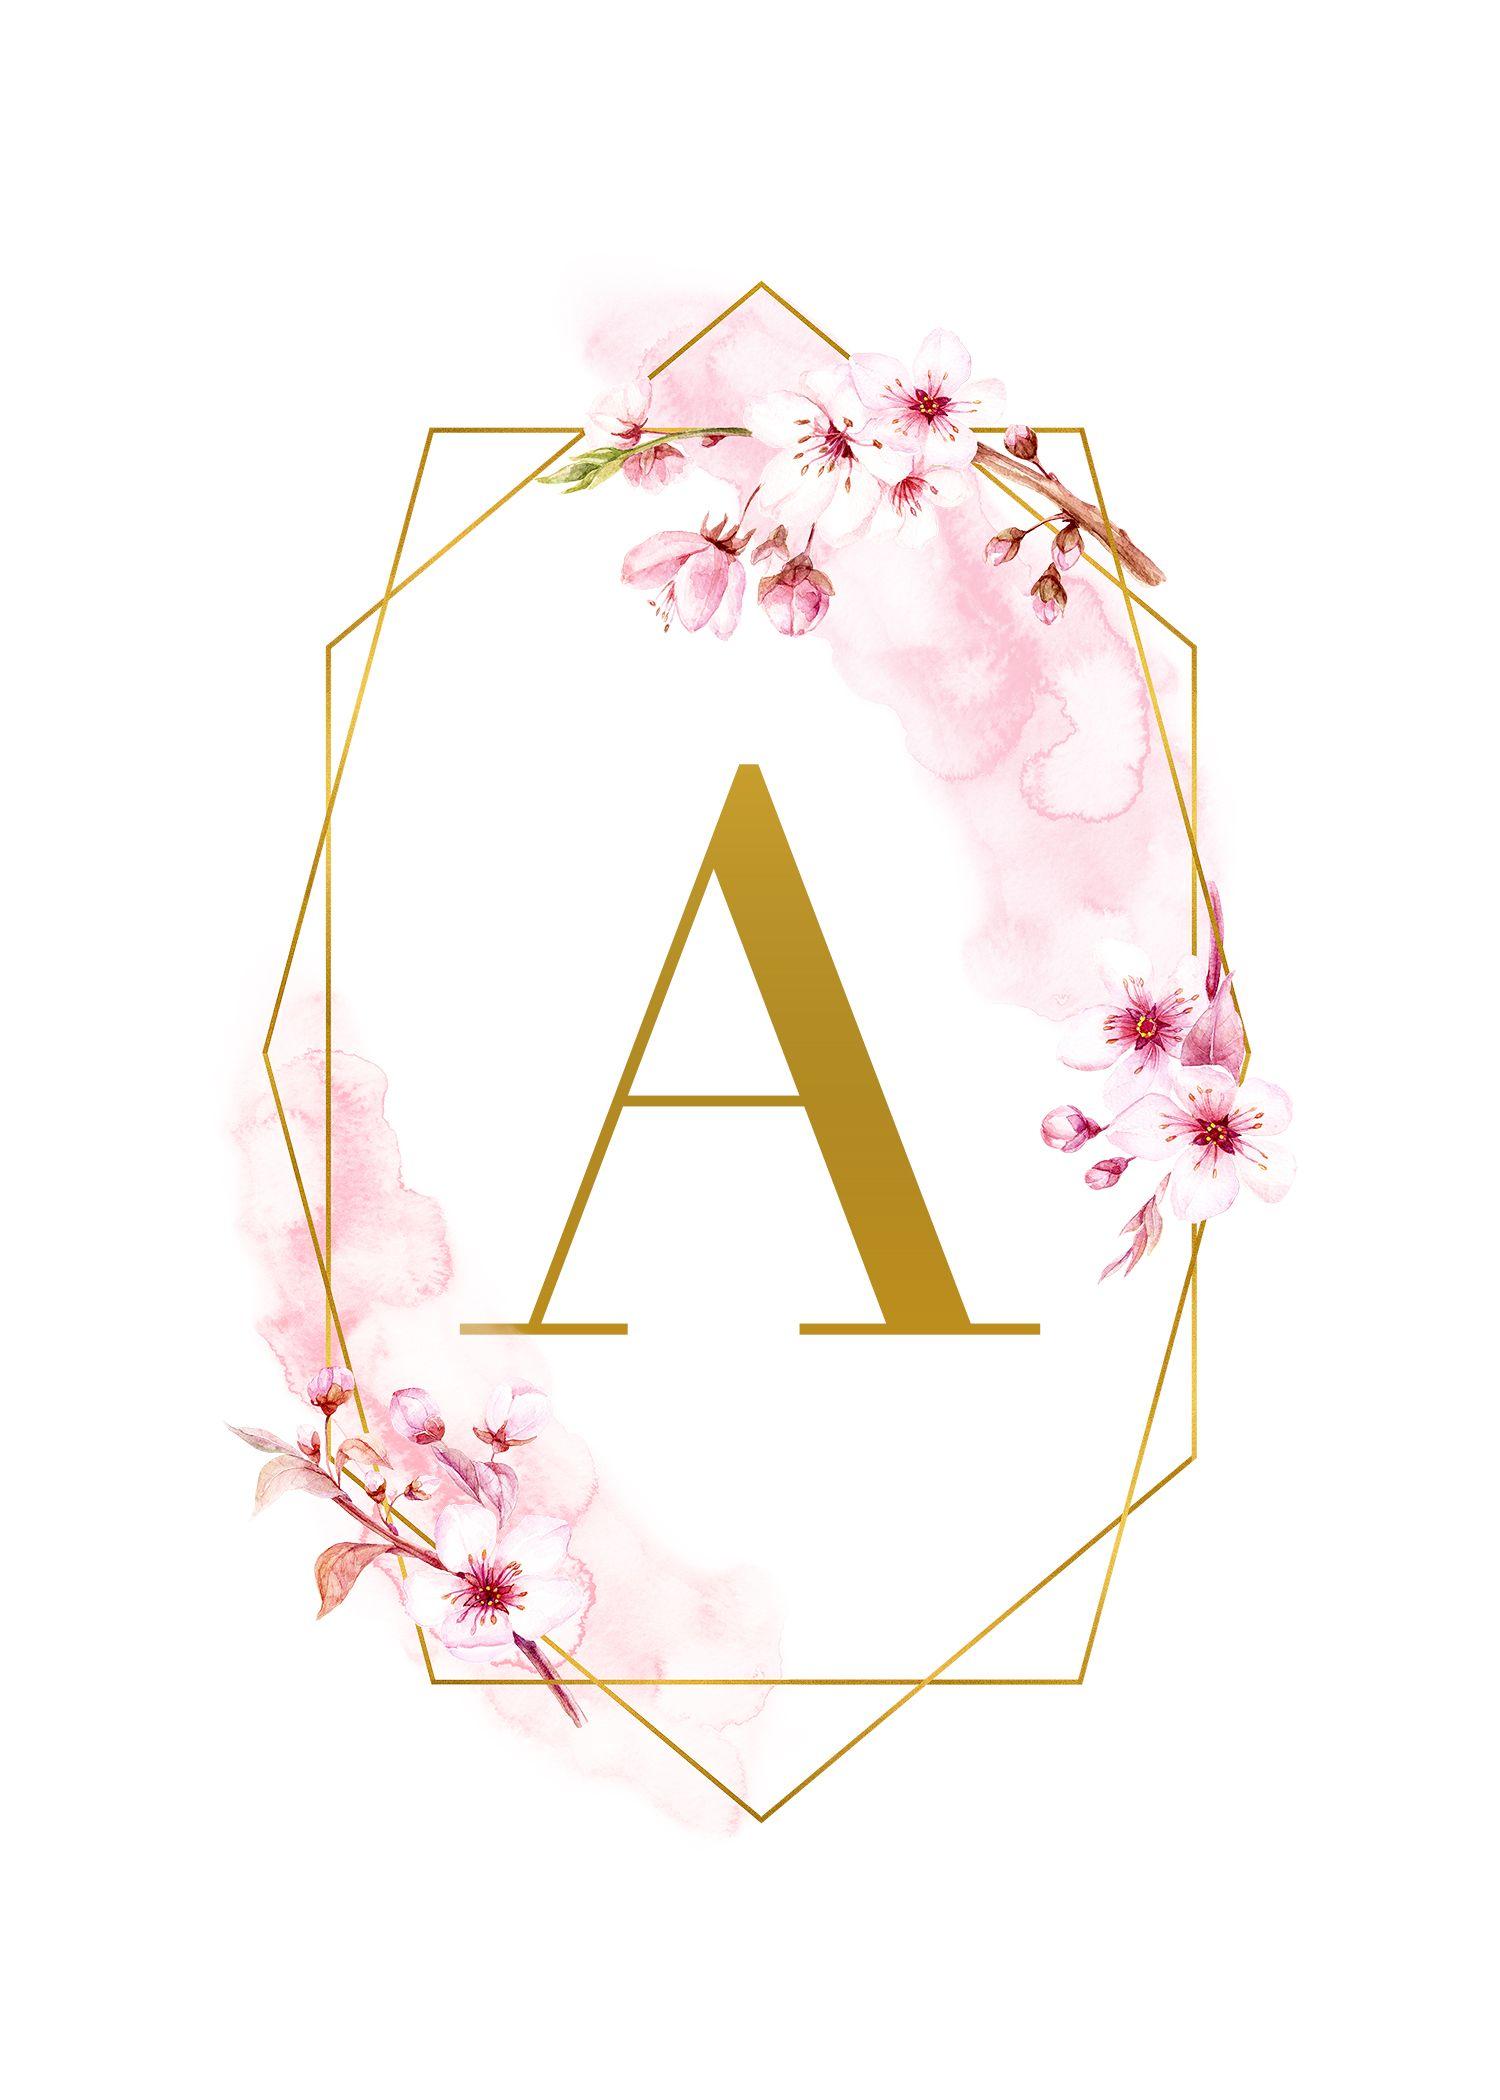 Free Printable Spring Time Glam Monograms The Cottage Market Monograma Papel De Parede Papel De Parede Grafico Letras Com Flores